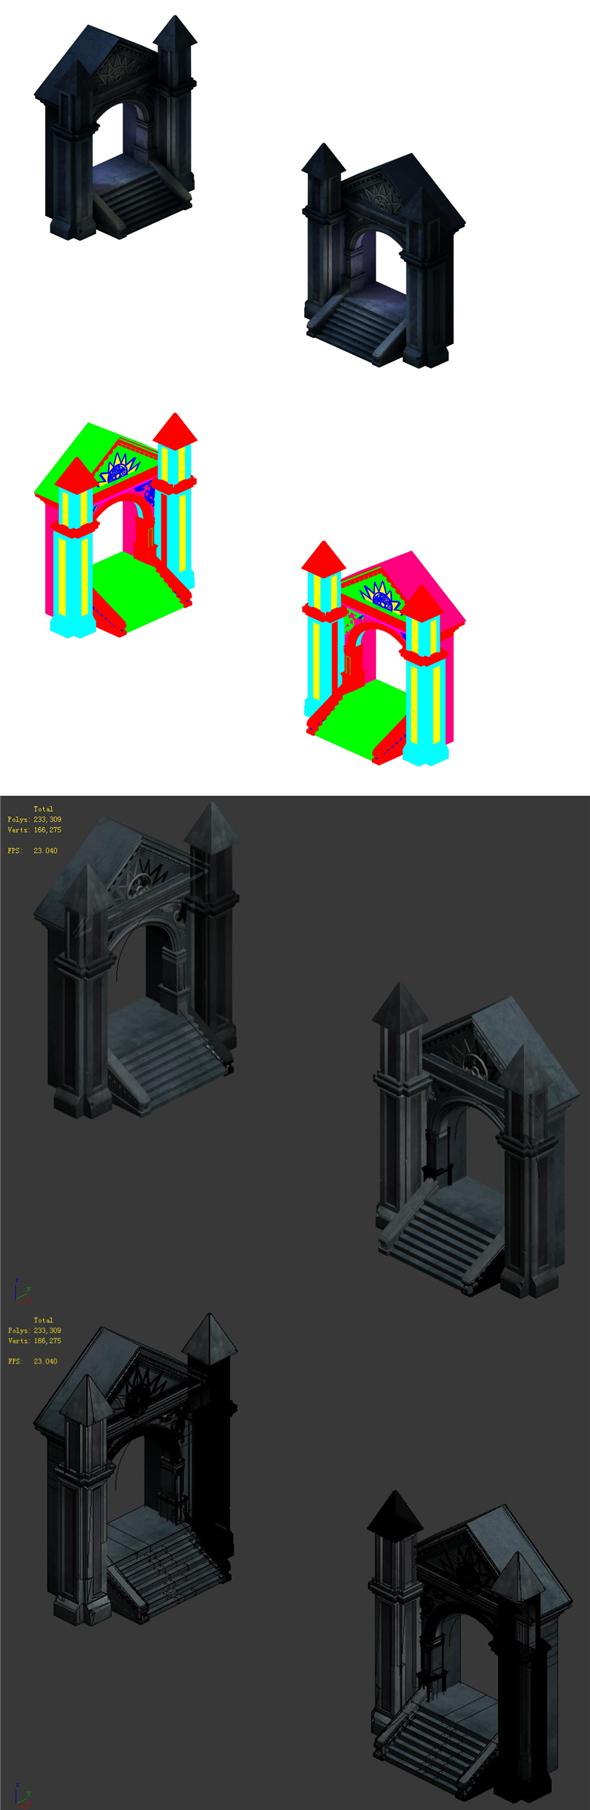 City Underground City Palace - Shimen - 3DOcean Item for Sale